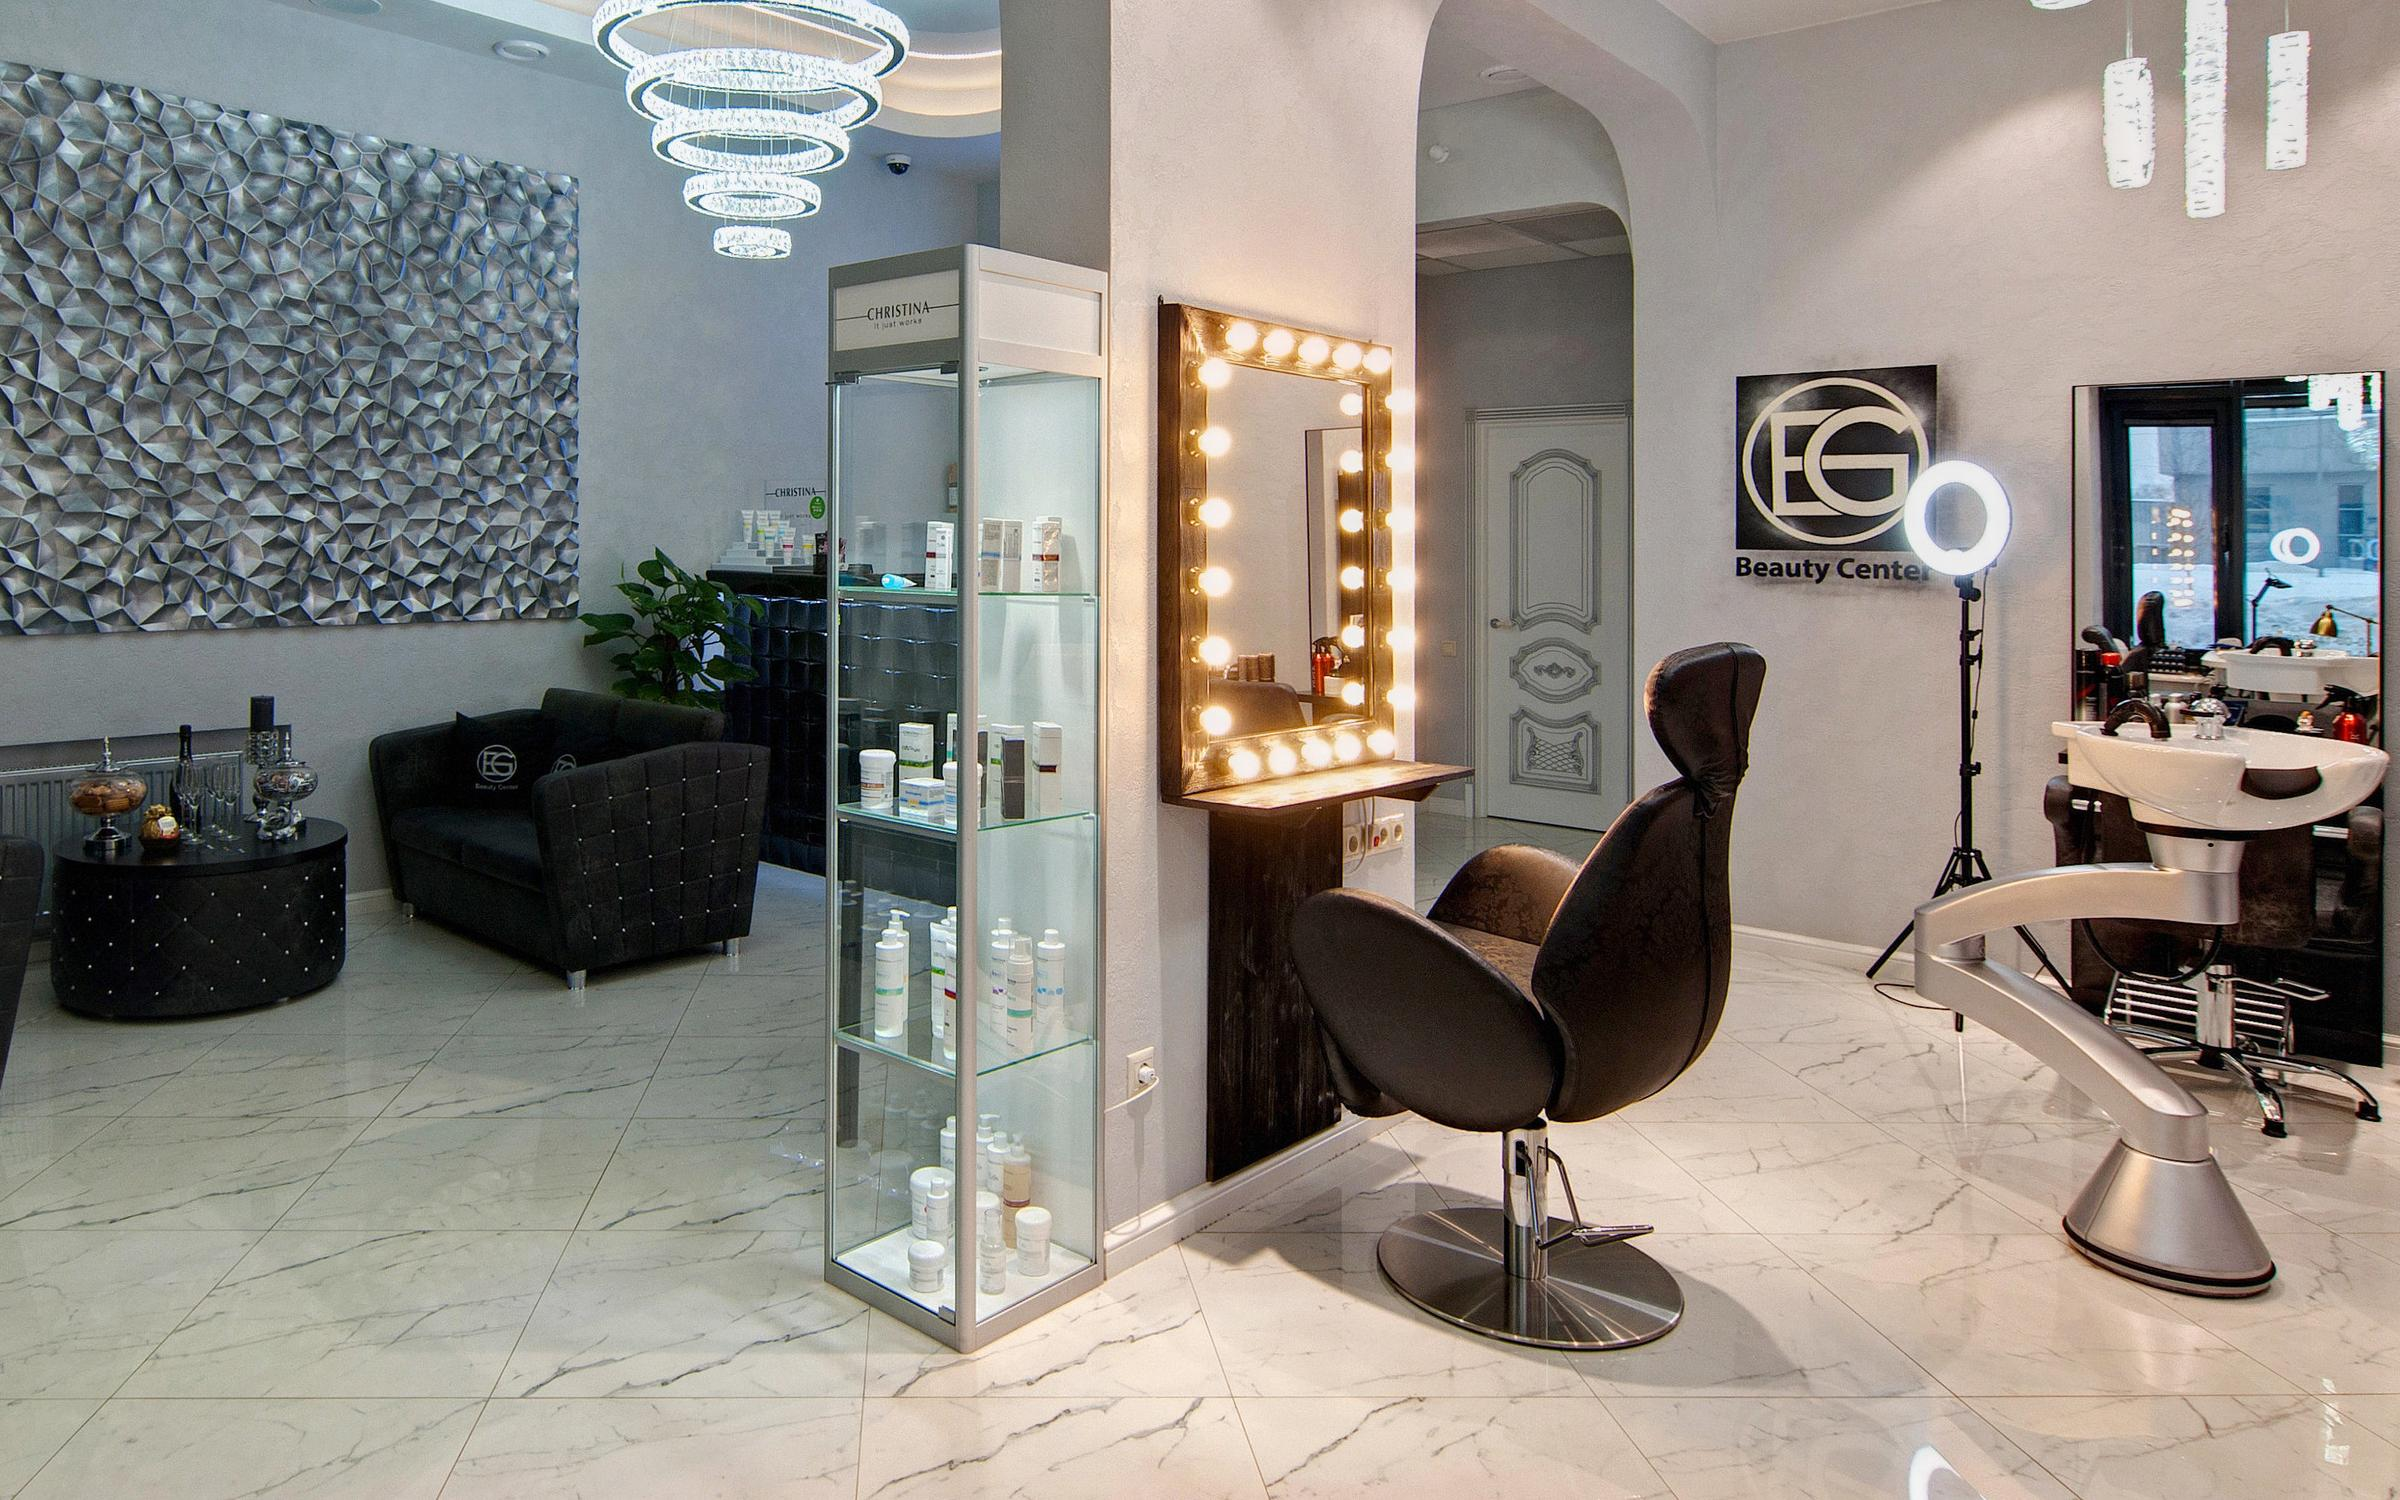 фотография Центра красоты EG beauty center